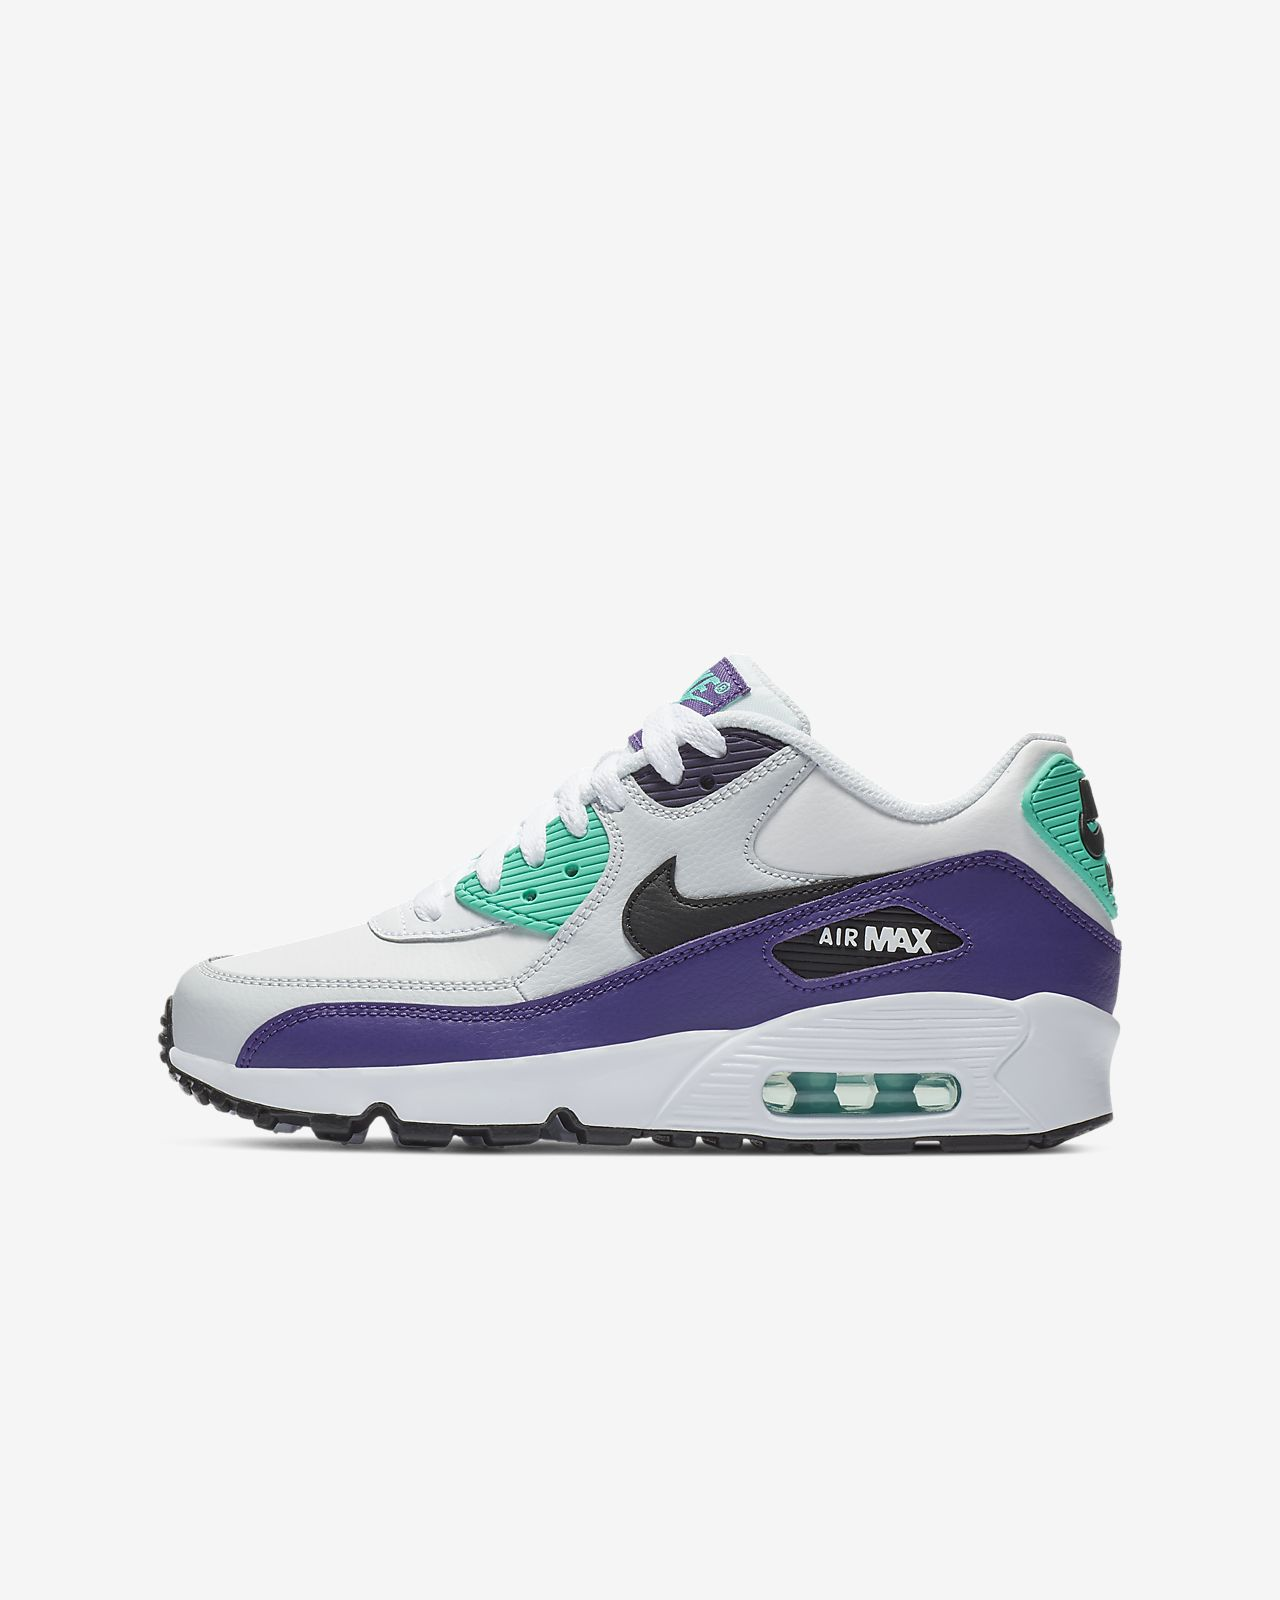 Nike Air Max 90 Leather Schuh für ältere Kinder